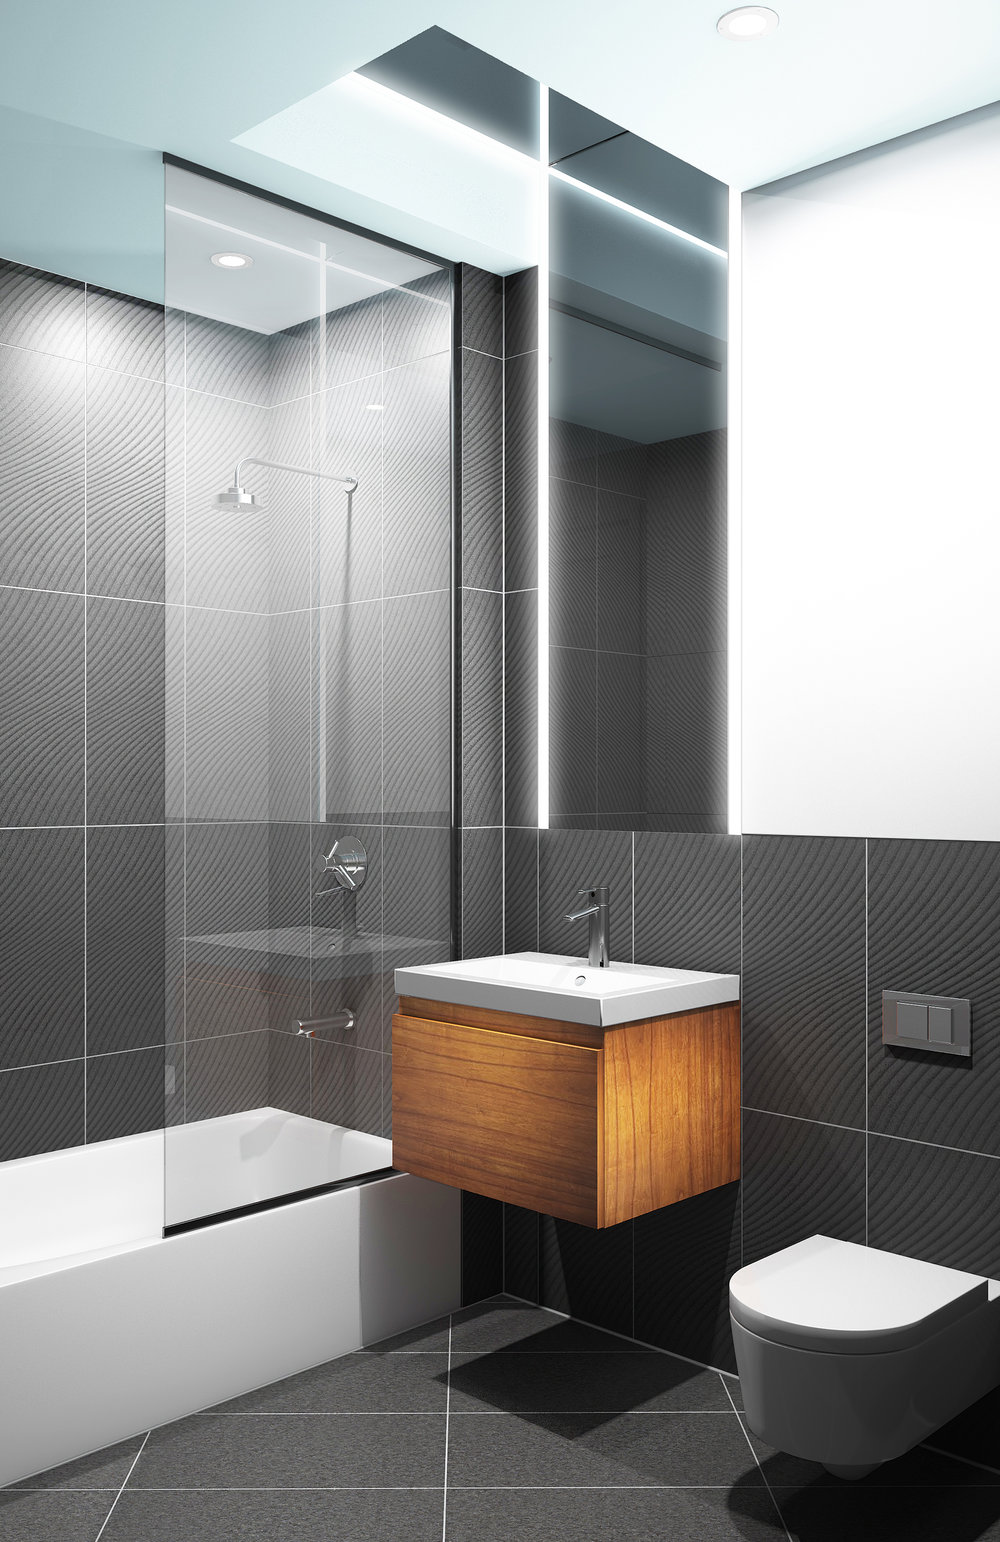 05_ Grand_St_649_Bk-Bath_Rendering_4.5.jpg